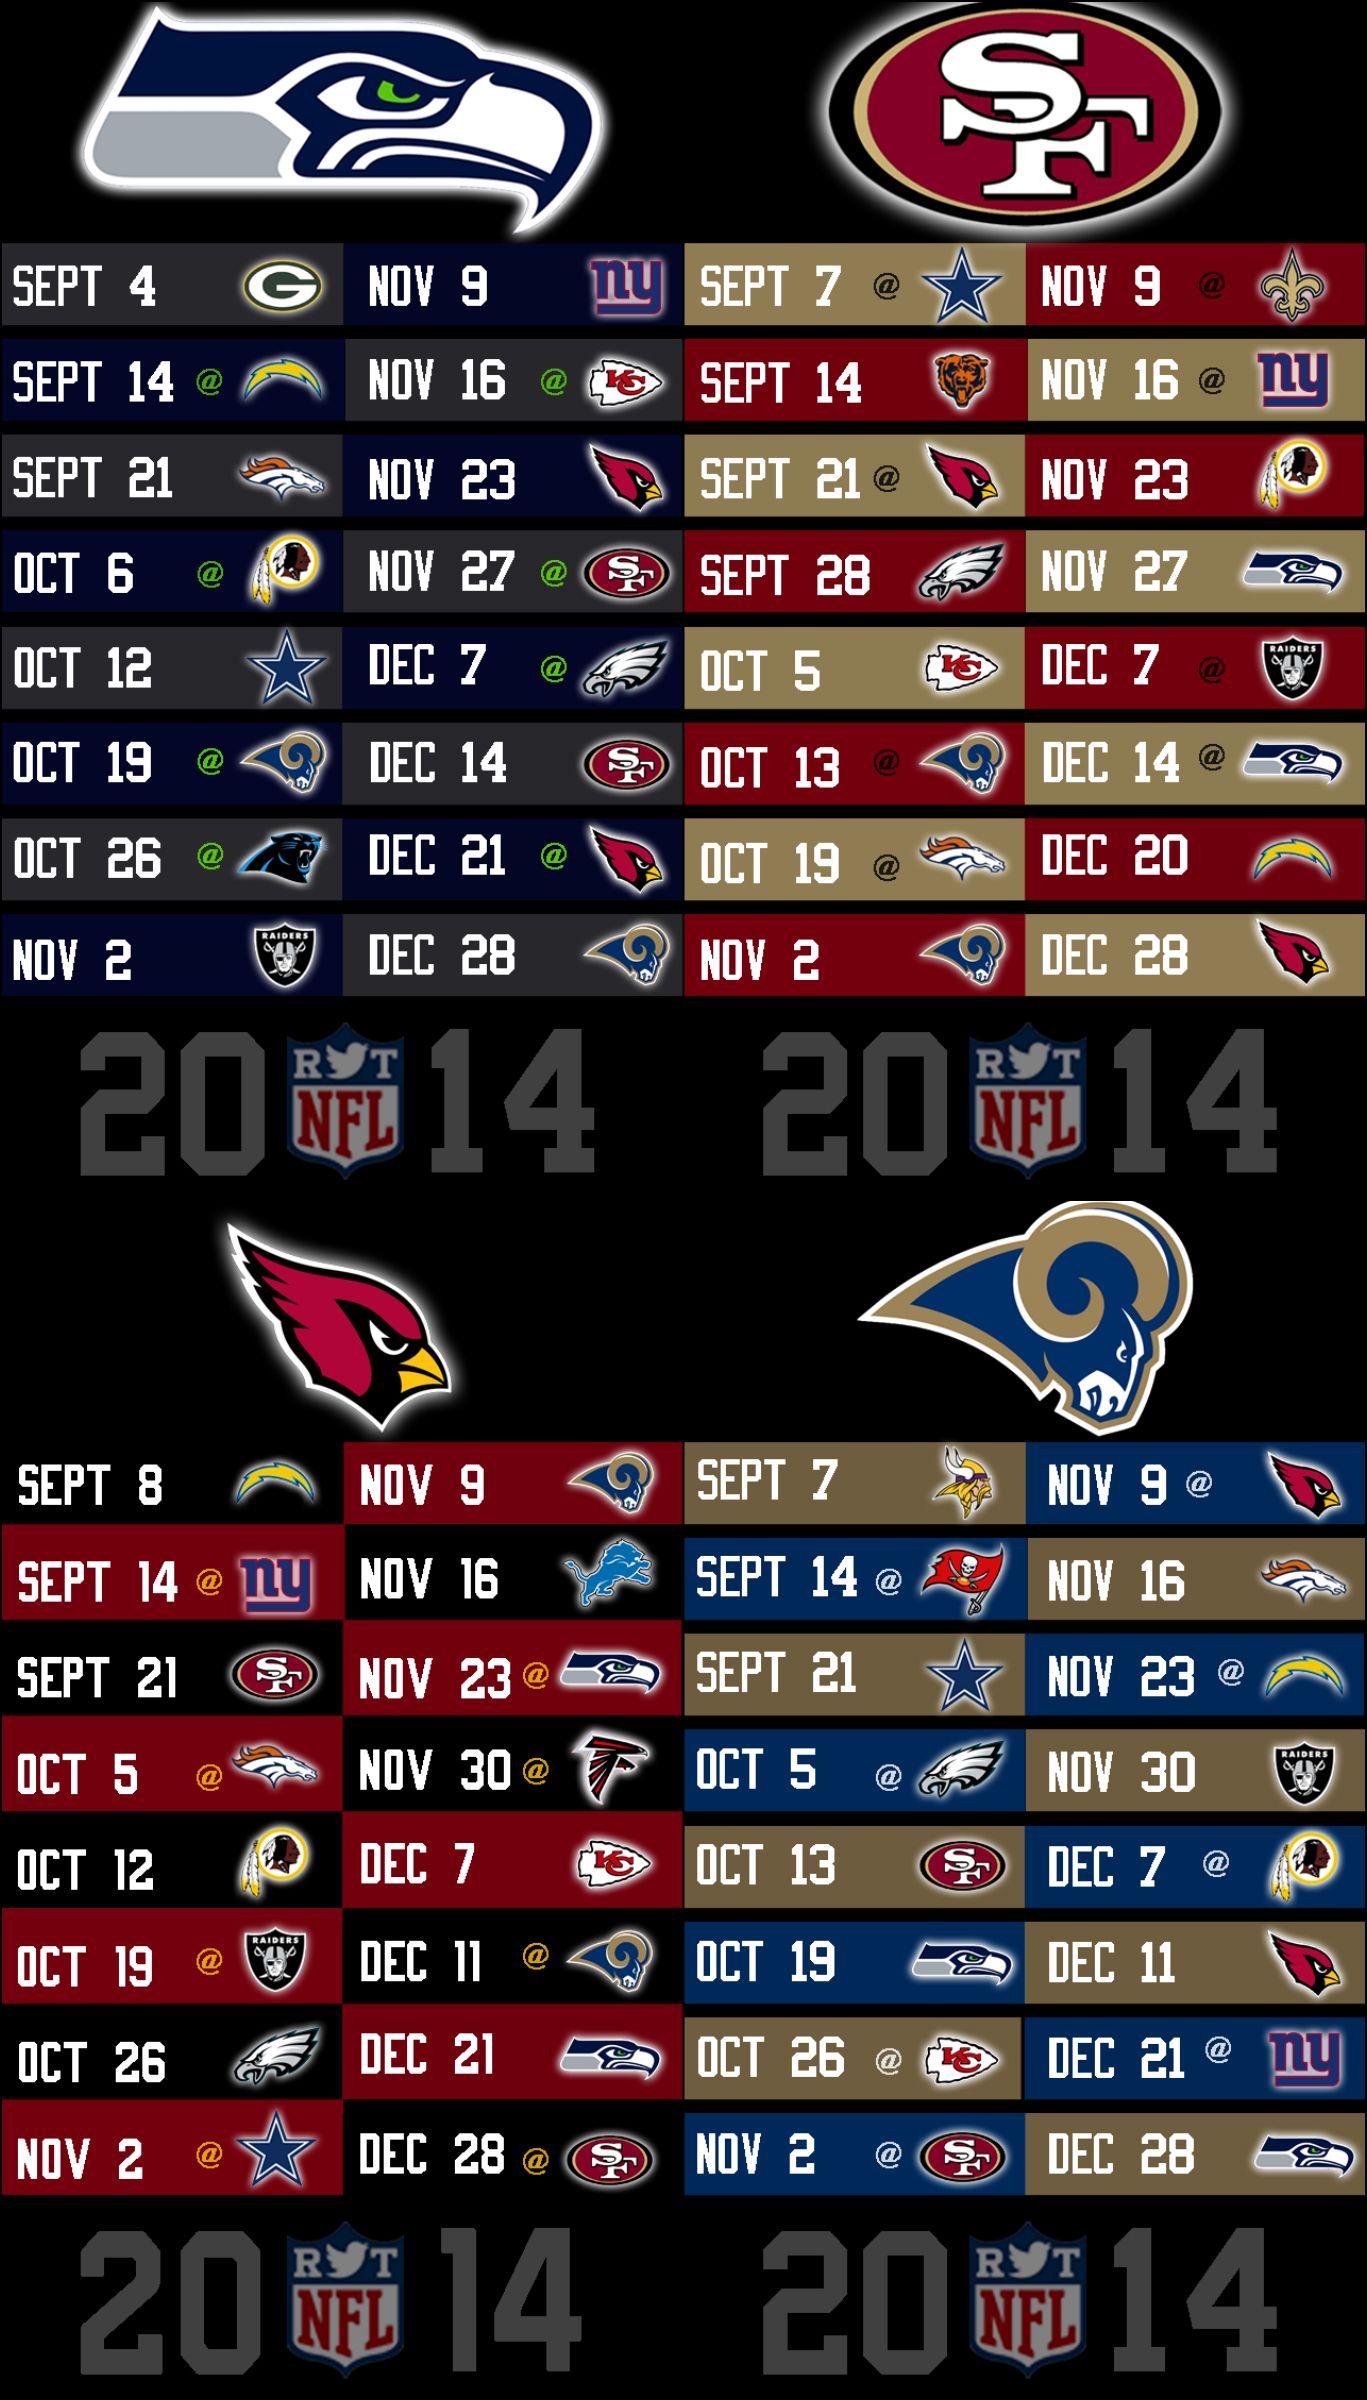 2014 NFL Schedule Wallpapers for iPhone 5 NFLRT Nfl